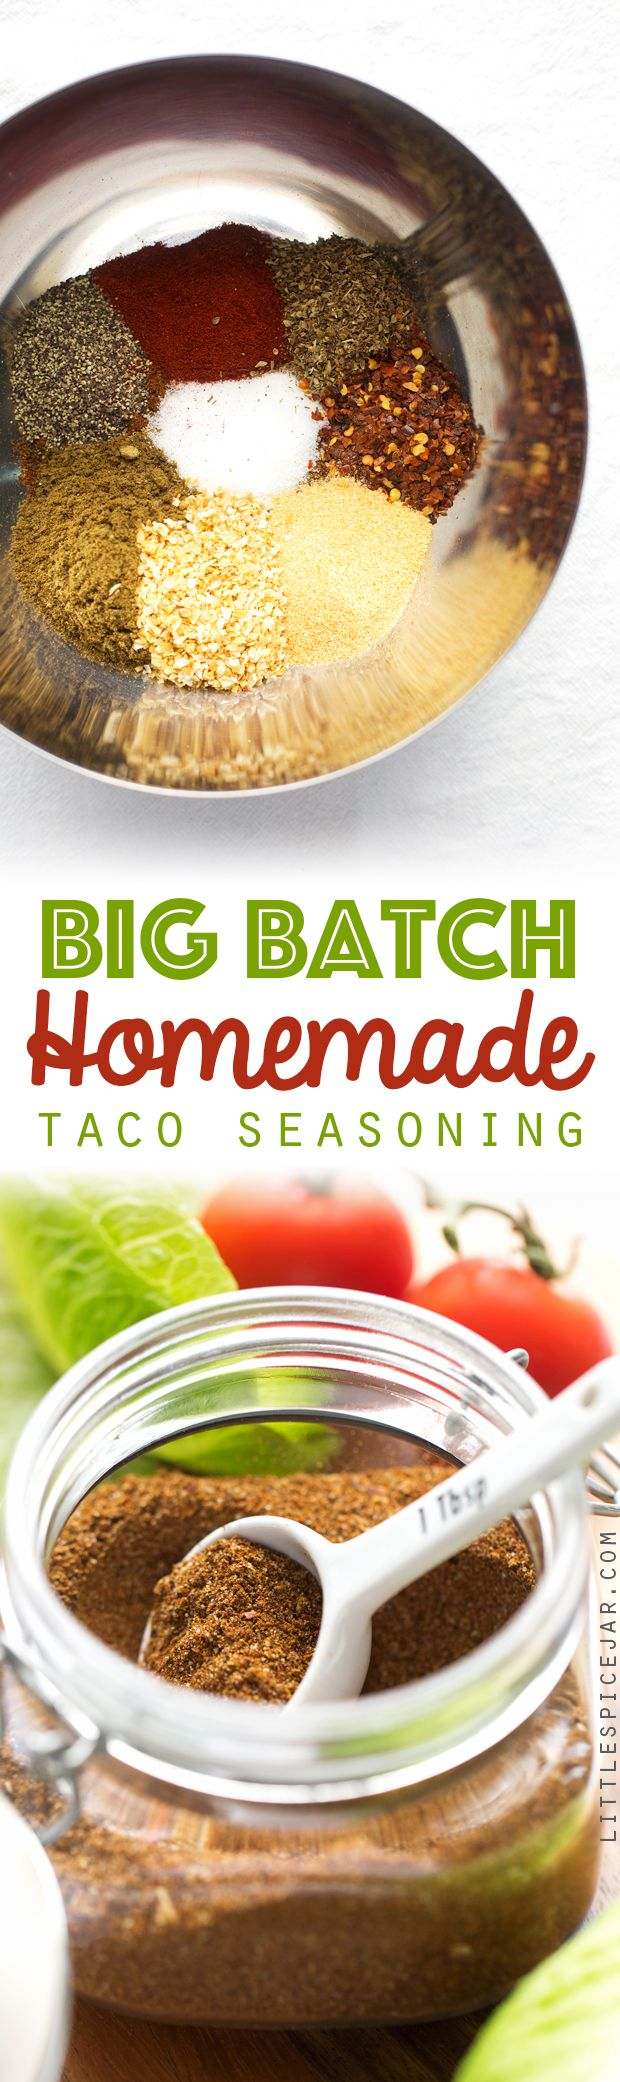 big-batch-homemade-taco-seasoning-4(2)